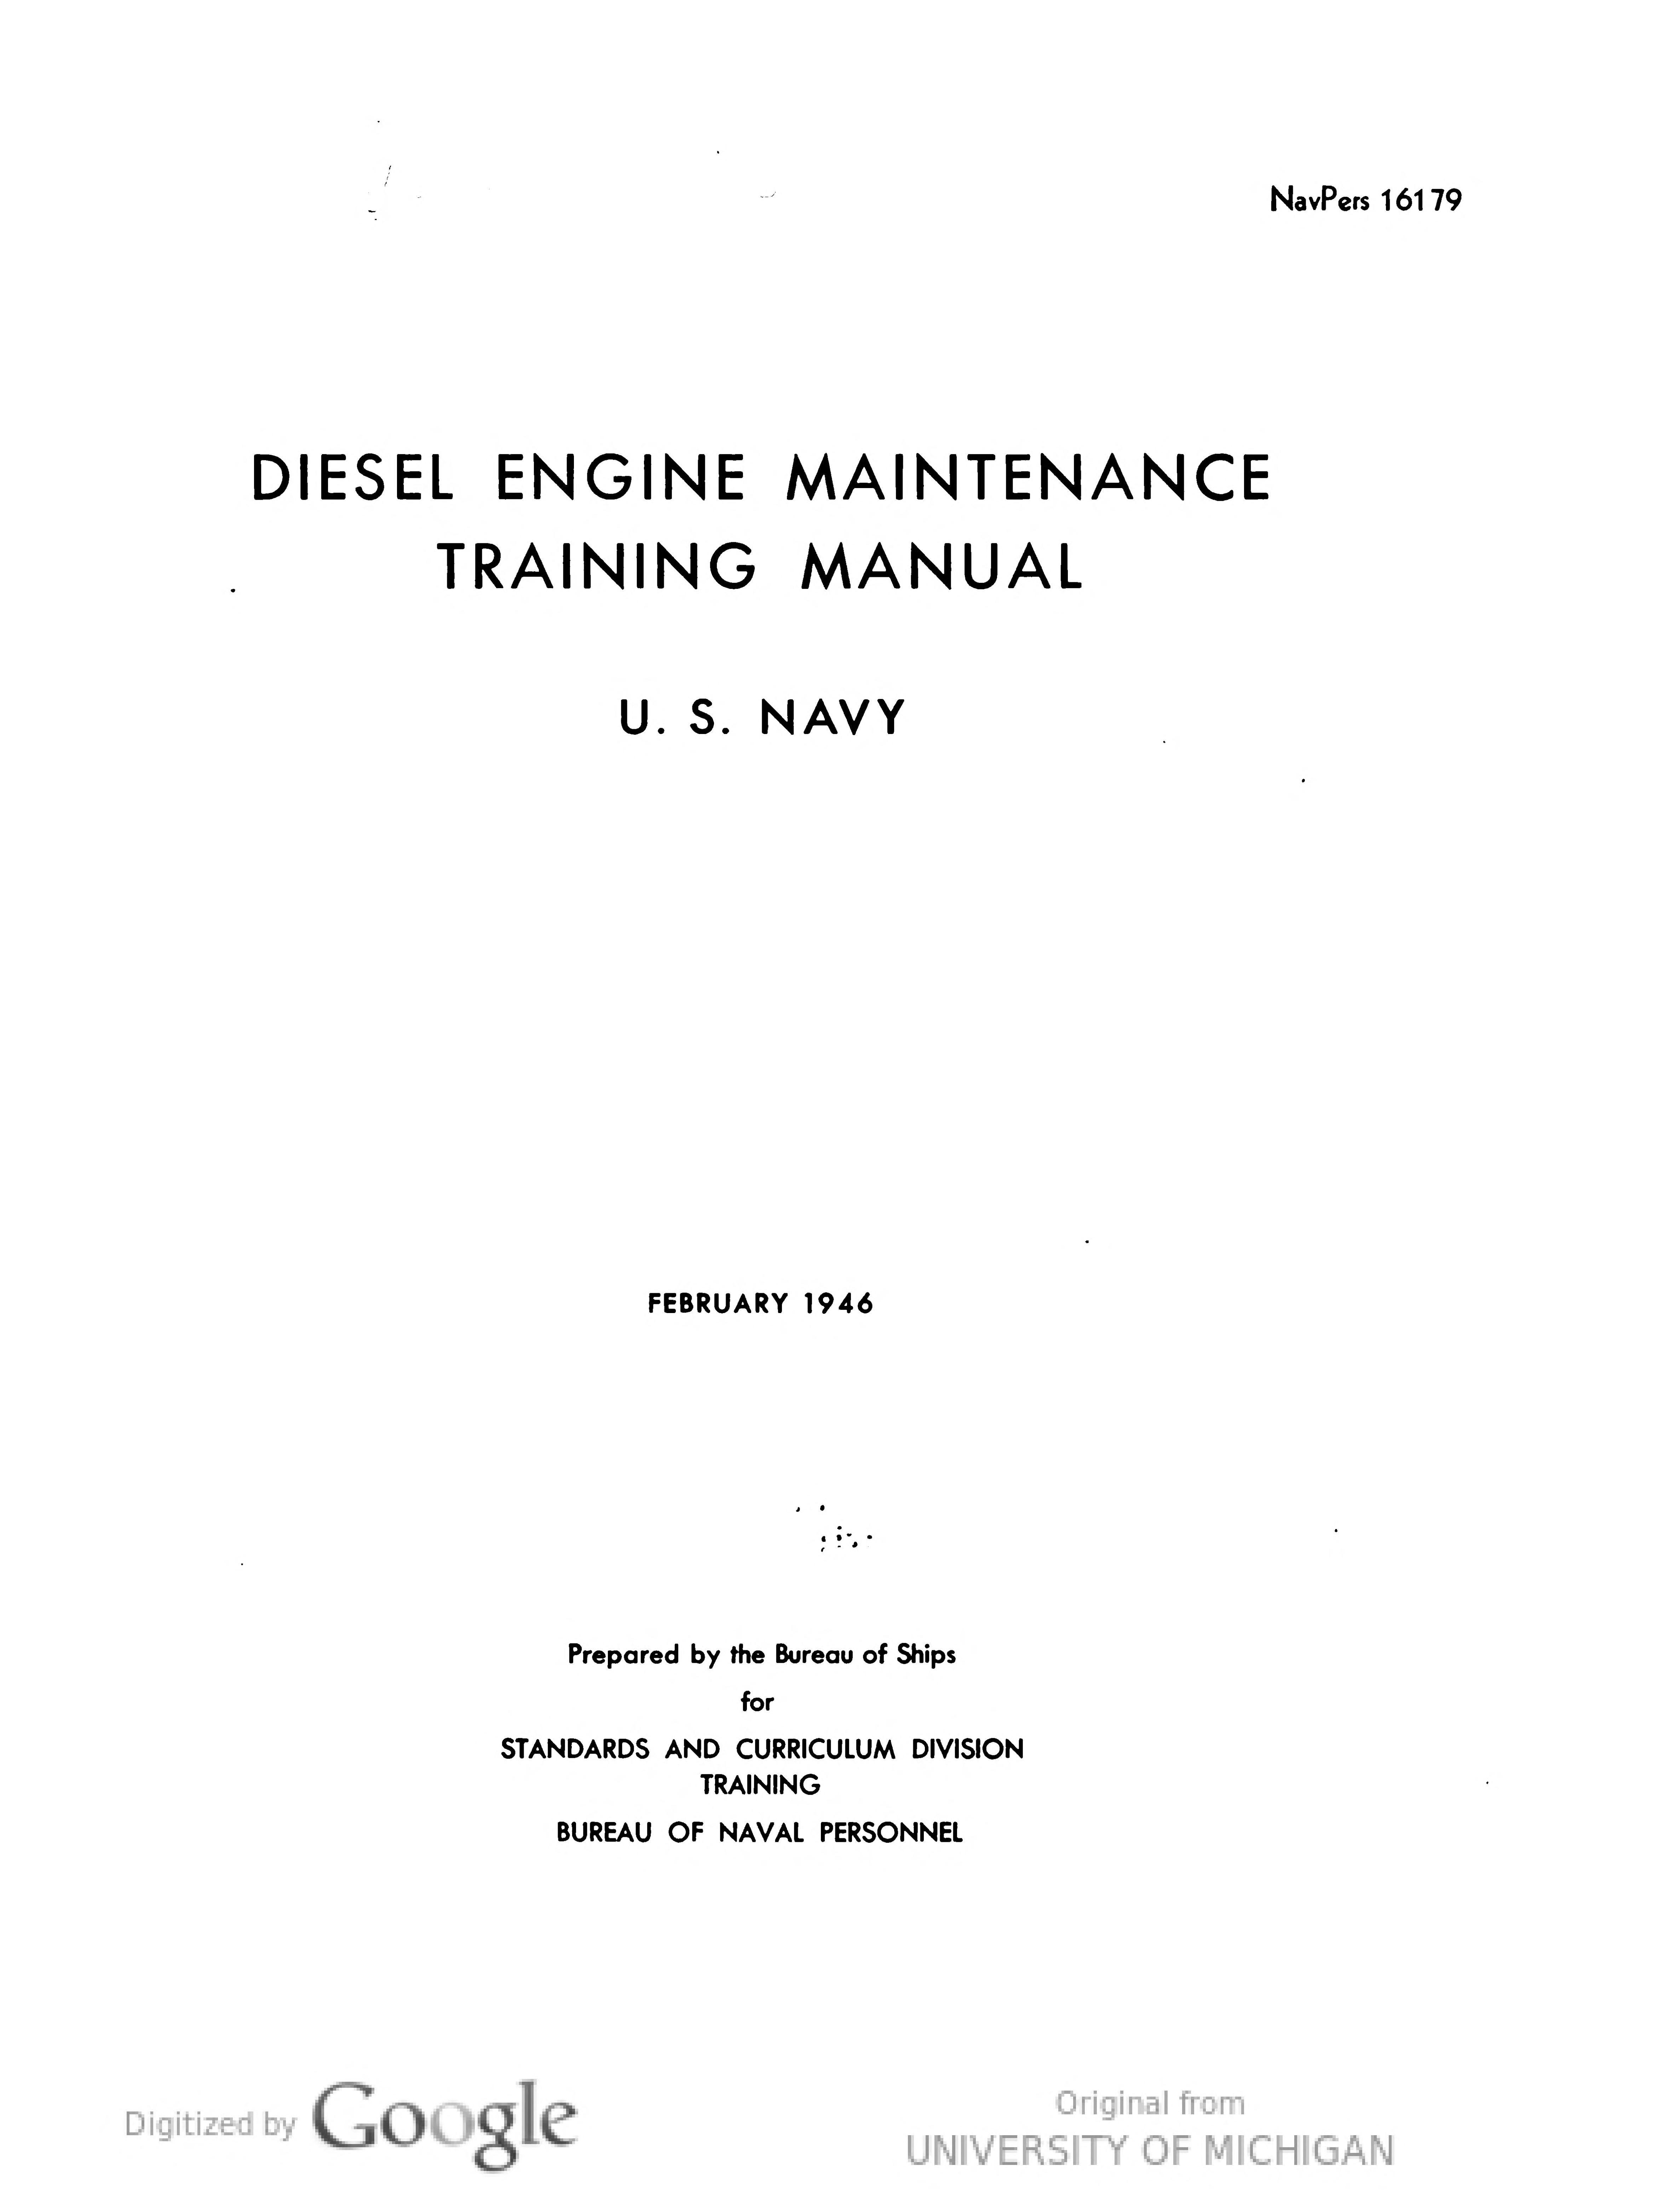 Diesel Engine Maintenance Training Manual Diesel Engine, Manual,  Engineering, Textbook, User Guide